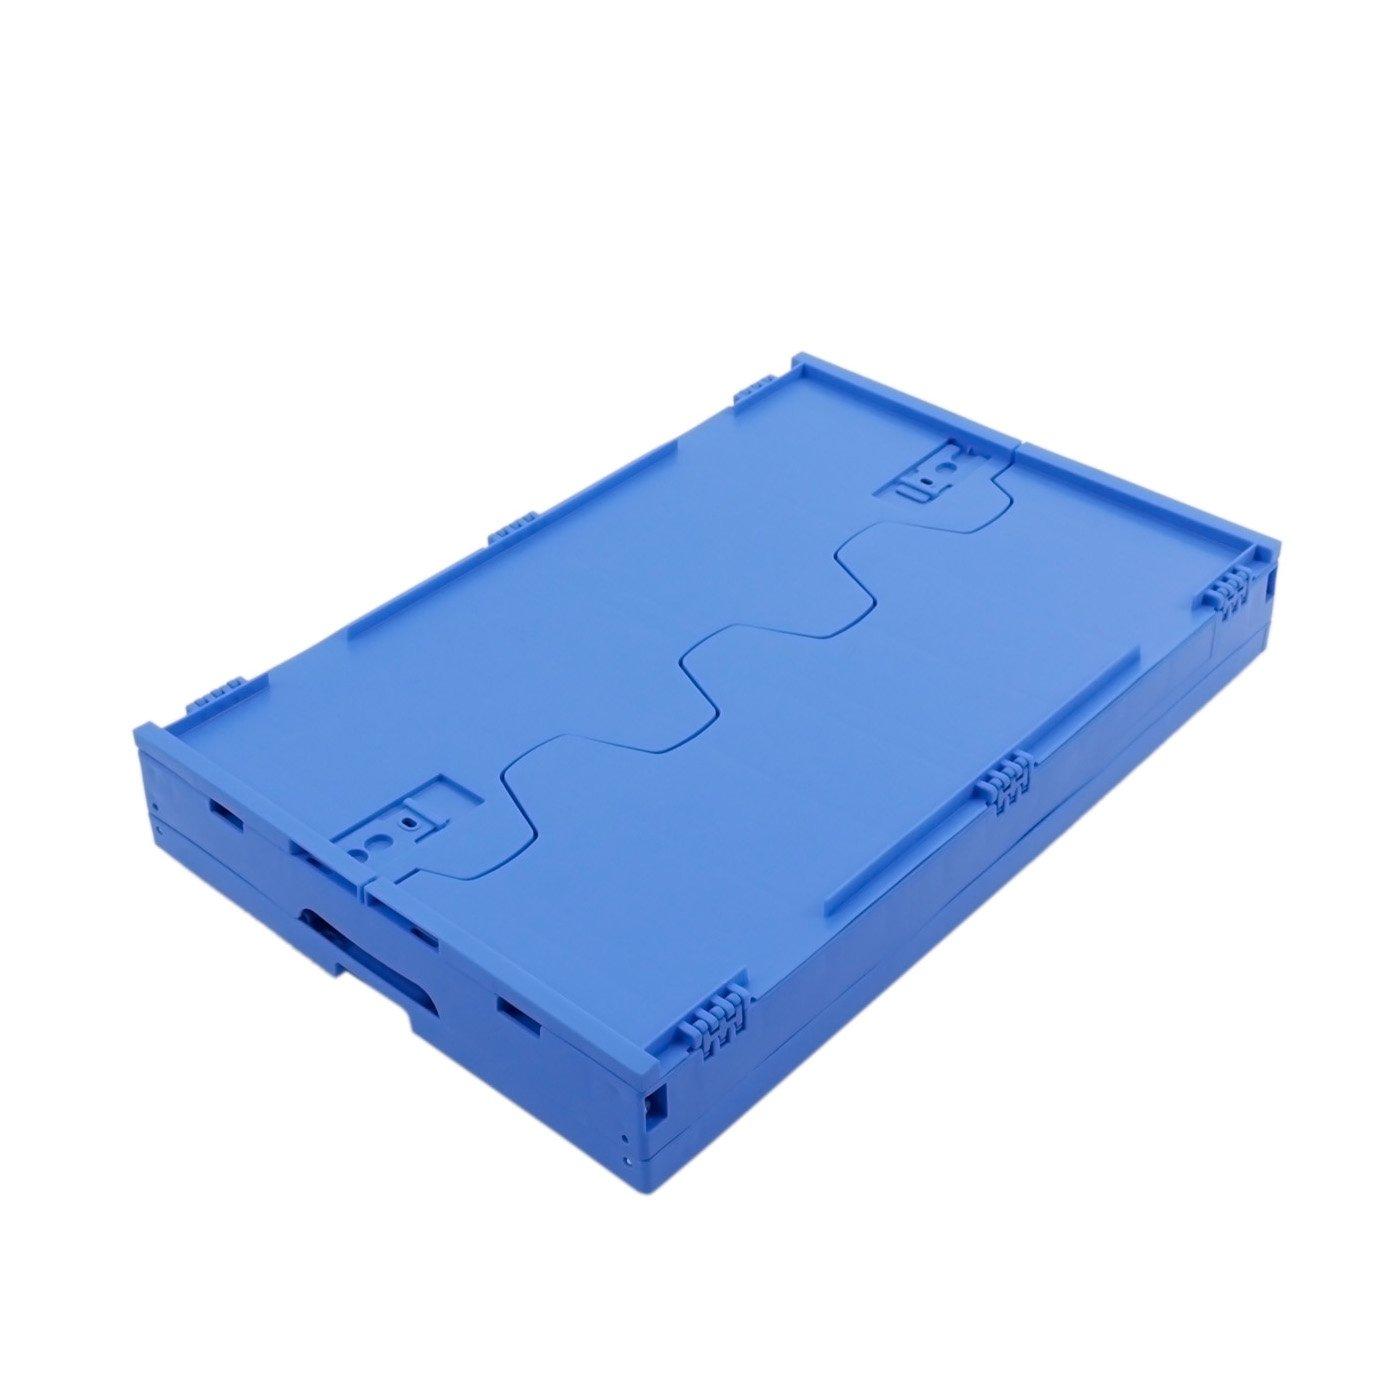 Plastikbox max Transportbox stabile Klappbox Made in Germany KLAPPBOX 61 Liter Blau Kunststoff Transportkiste 60kg 60x40x32cm